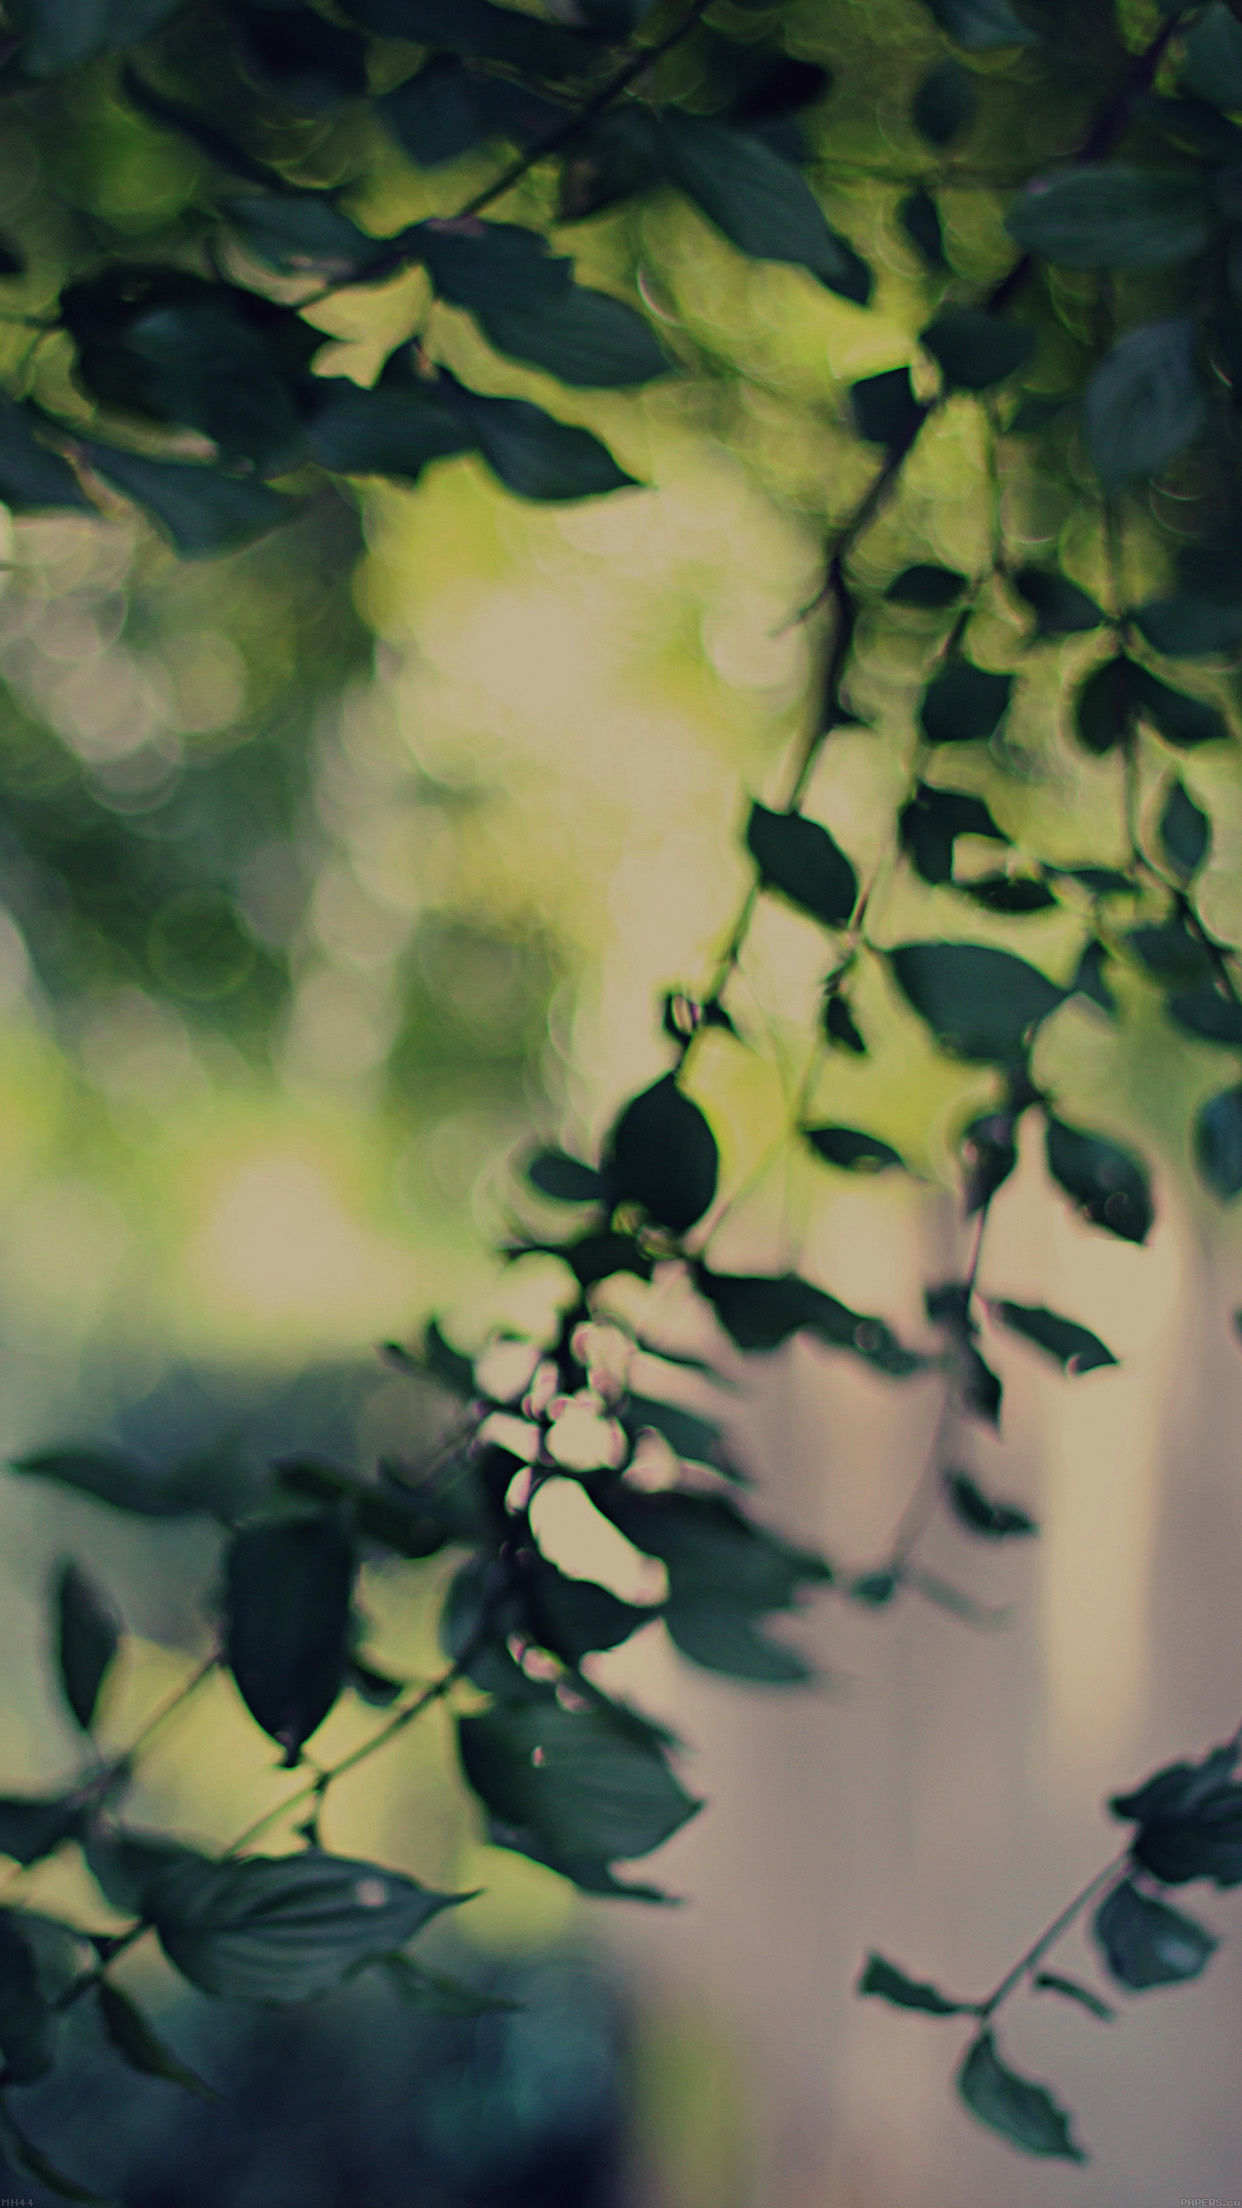 Android Phone Fall Wallpaper Mh44 Tree Bokeh Calm Lovely Morning Nature Park Wallpaper